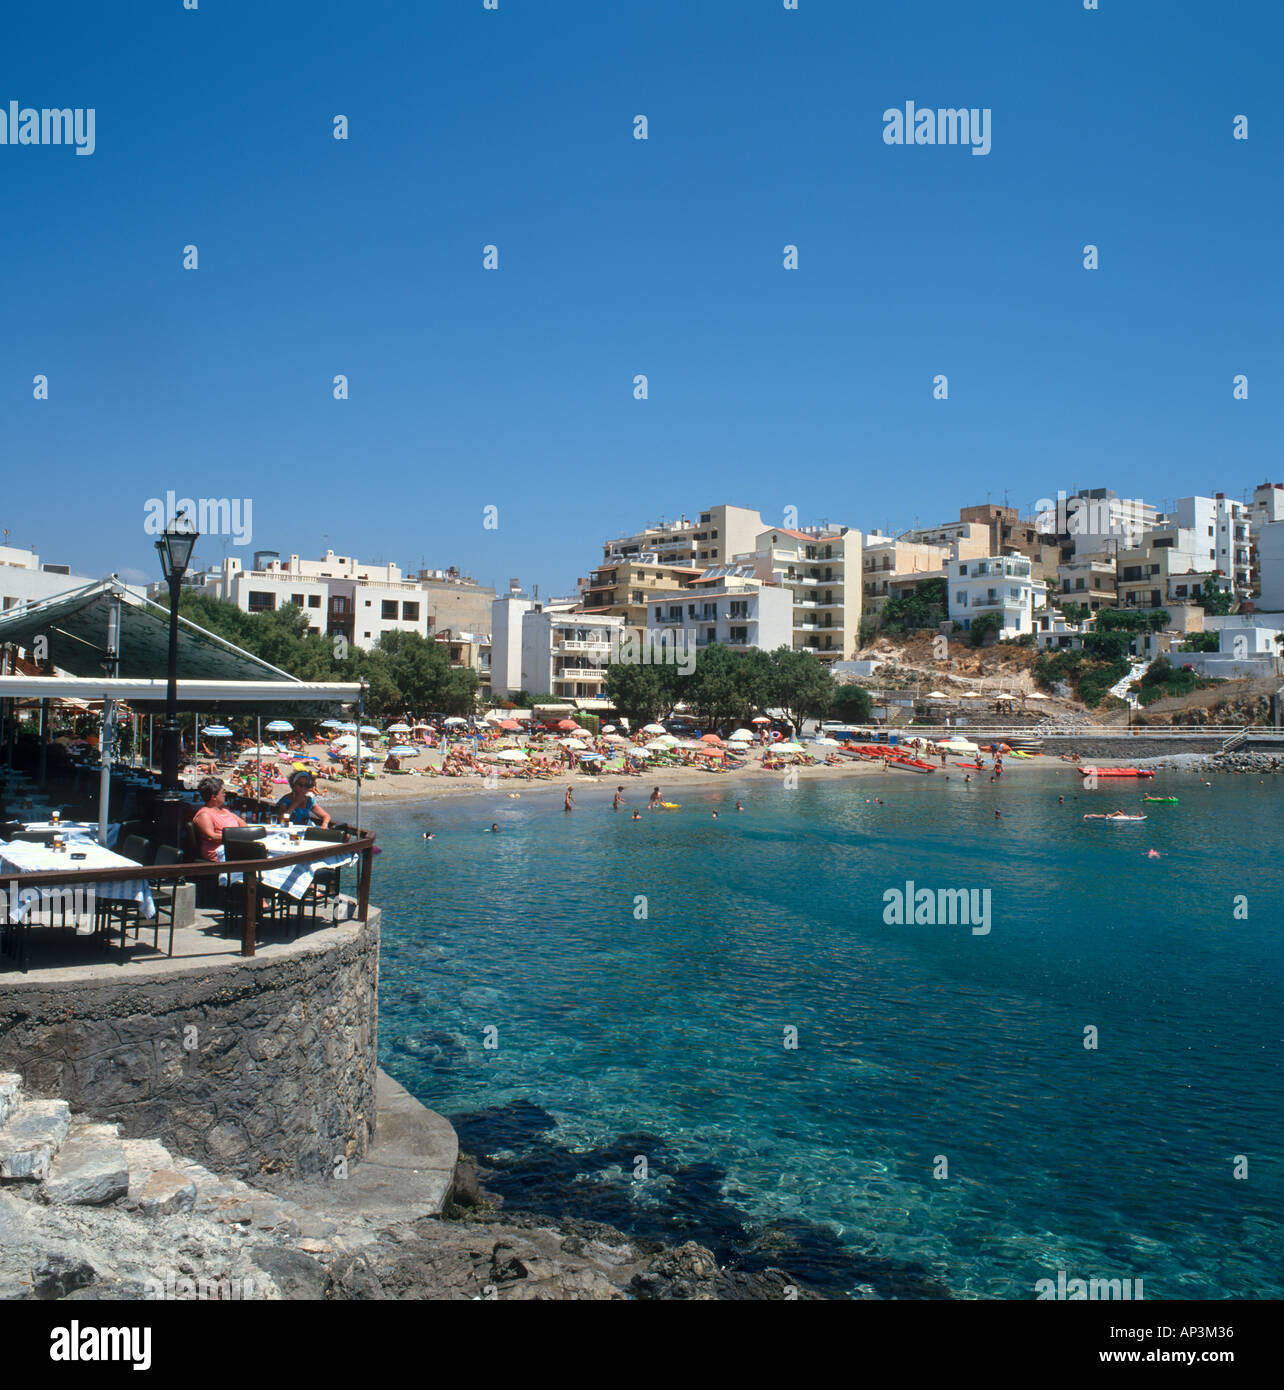 Town Beach, Aghios Nikolaos, North East Coast, Crete, Greece - Stock Image